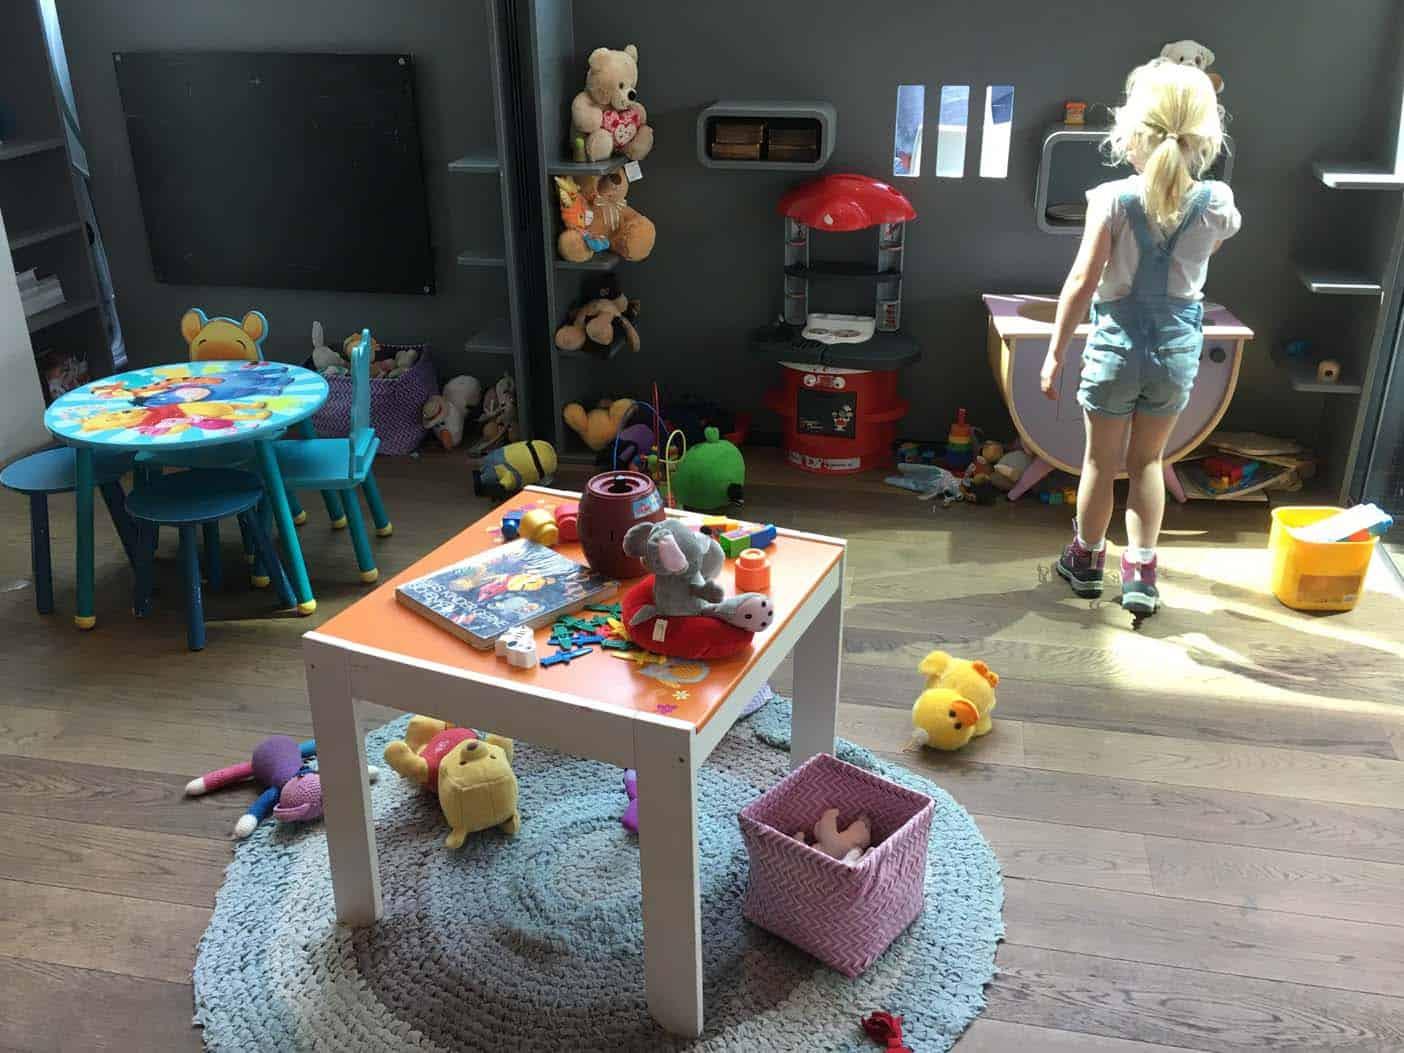 kindvriendelijk restaurant innsbruck